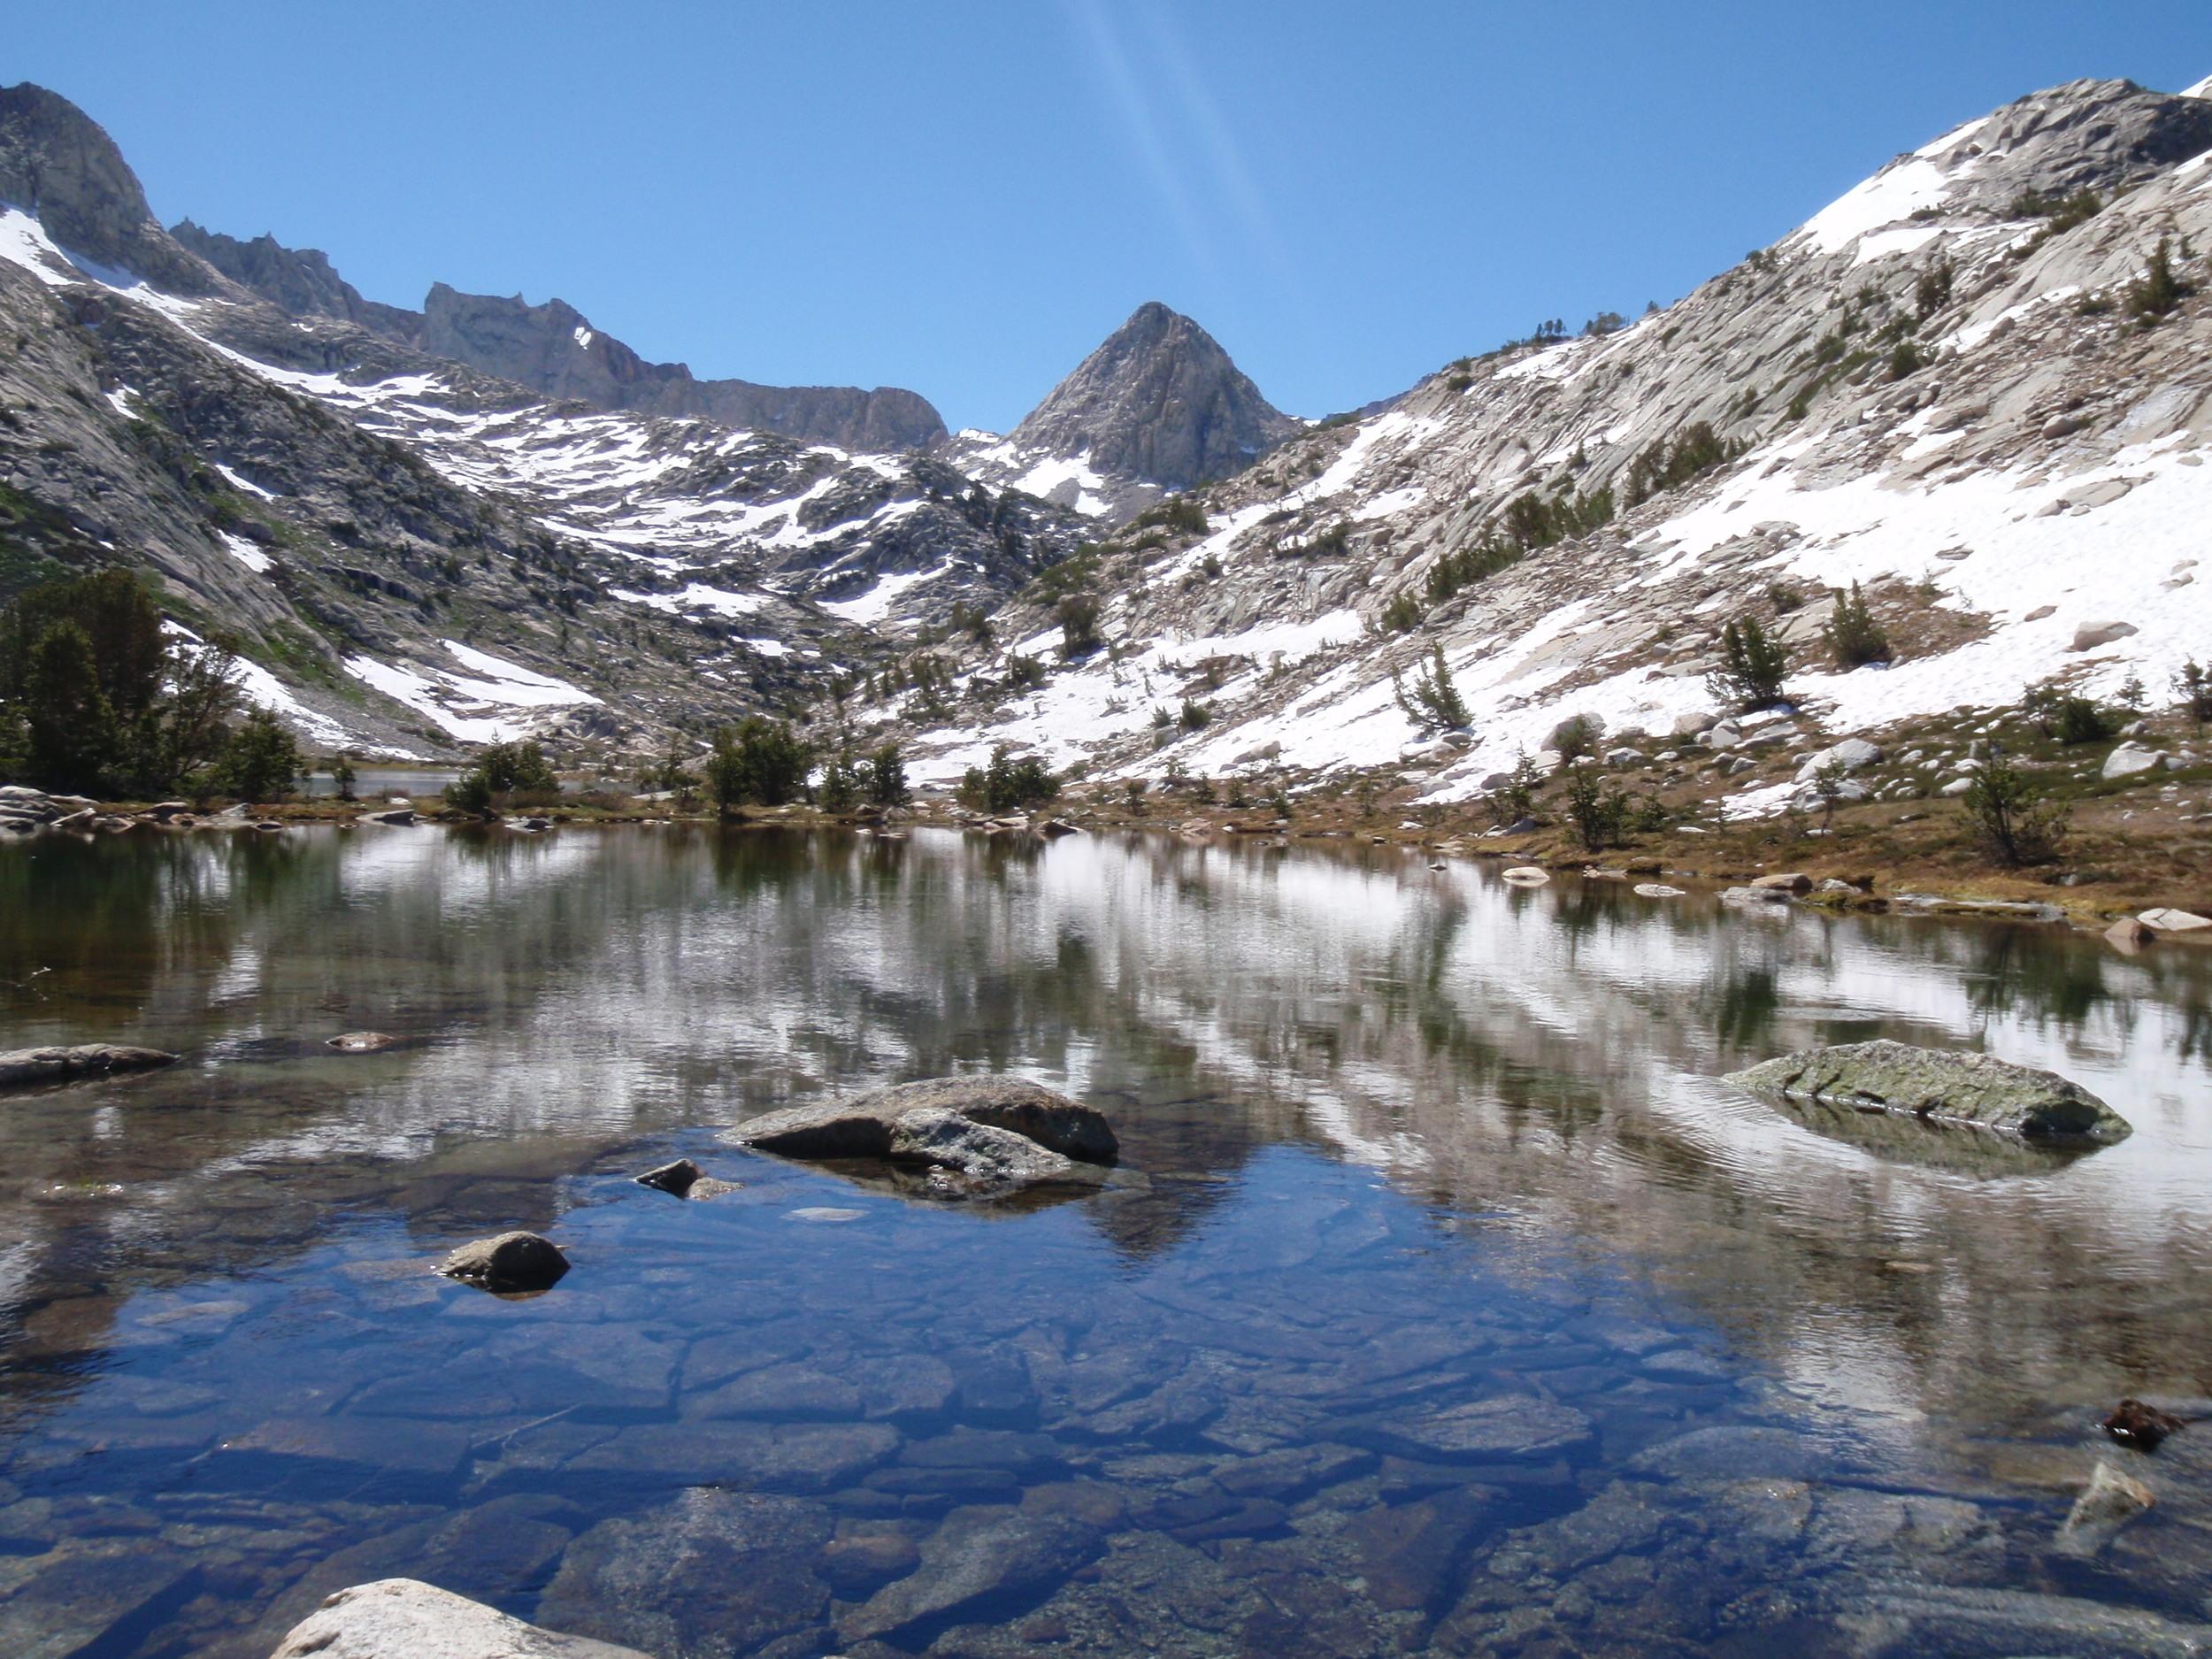 Mt Spencer reflected in Evolution Lake